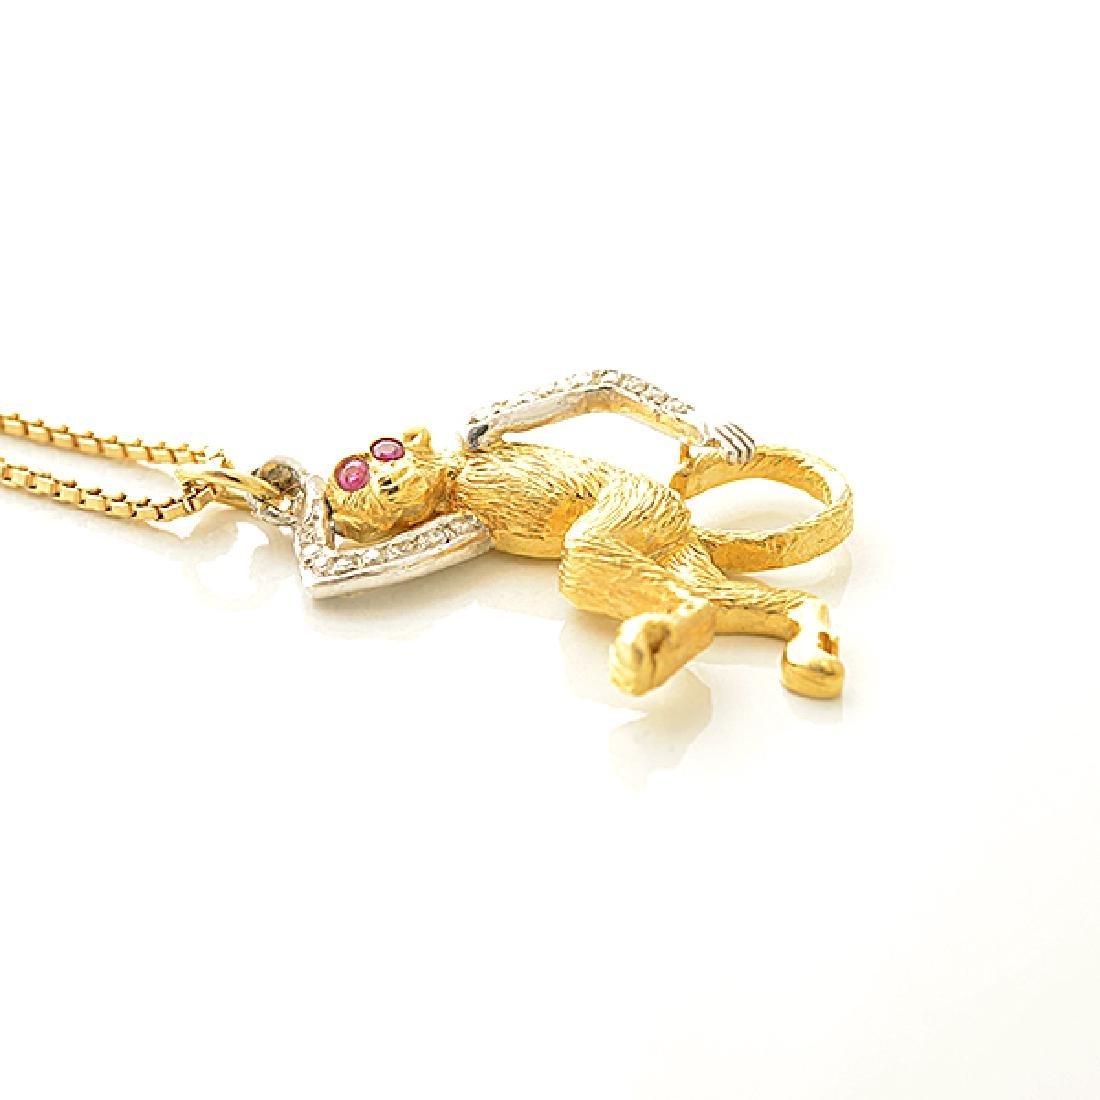 Diamond, Ruby, Gold Monkey Pendant Necklace. - 3